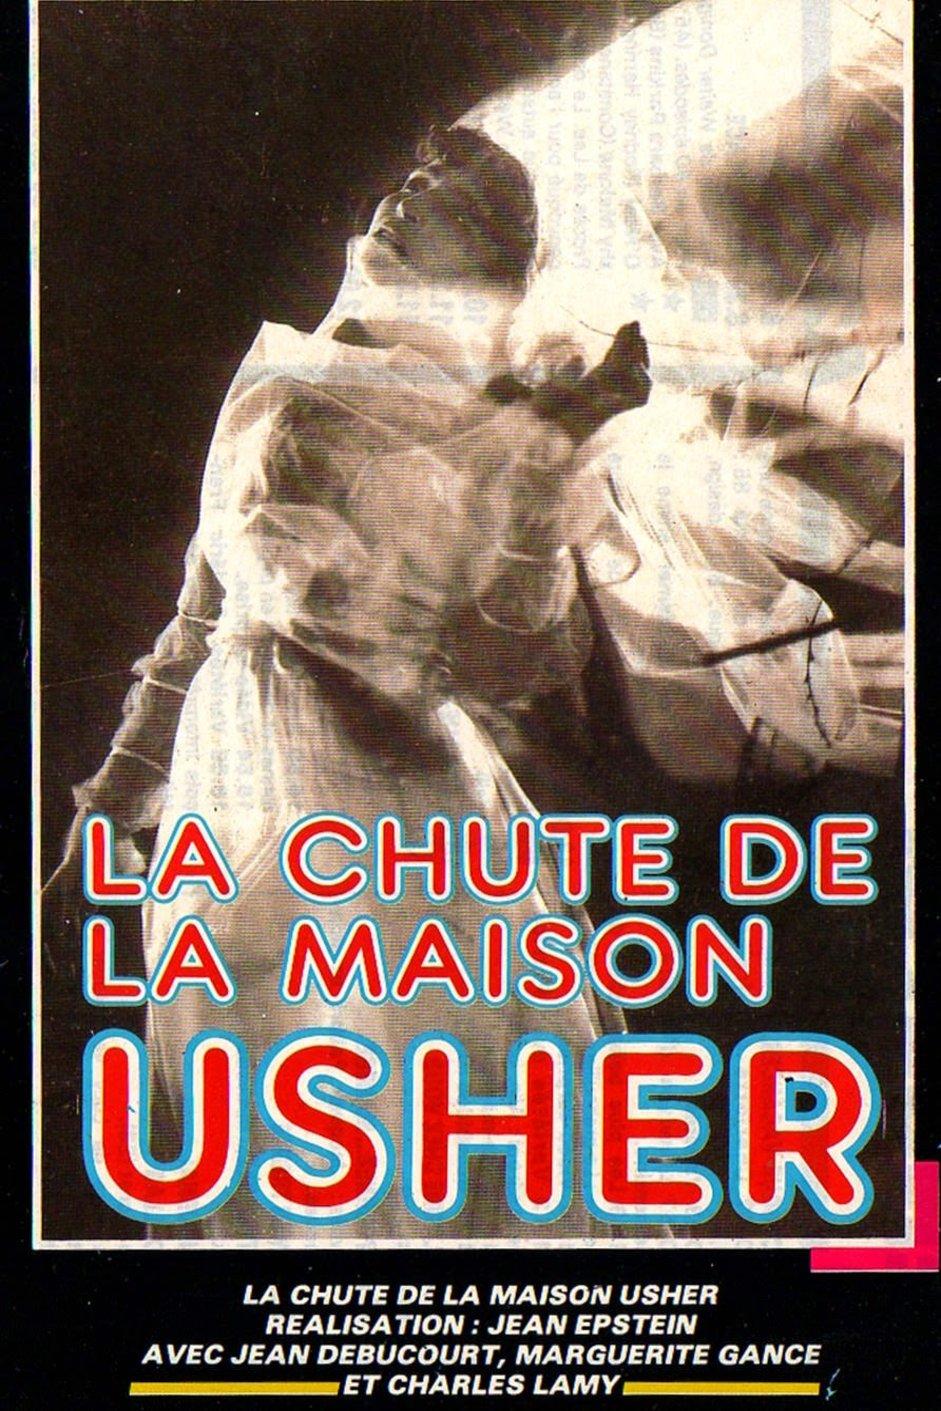 La Chute De La Maison Usher Film : chute, maison, usher, Chute, Maison, Usher, (1928), Epstein